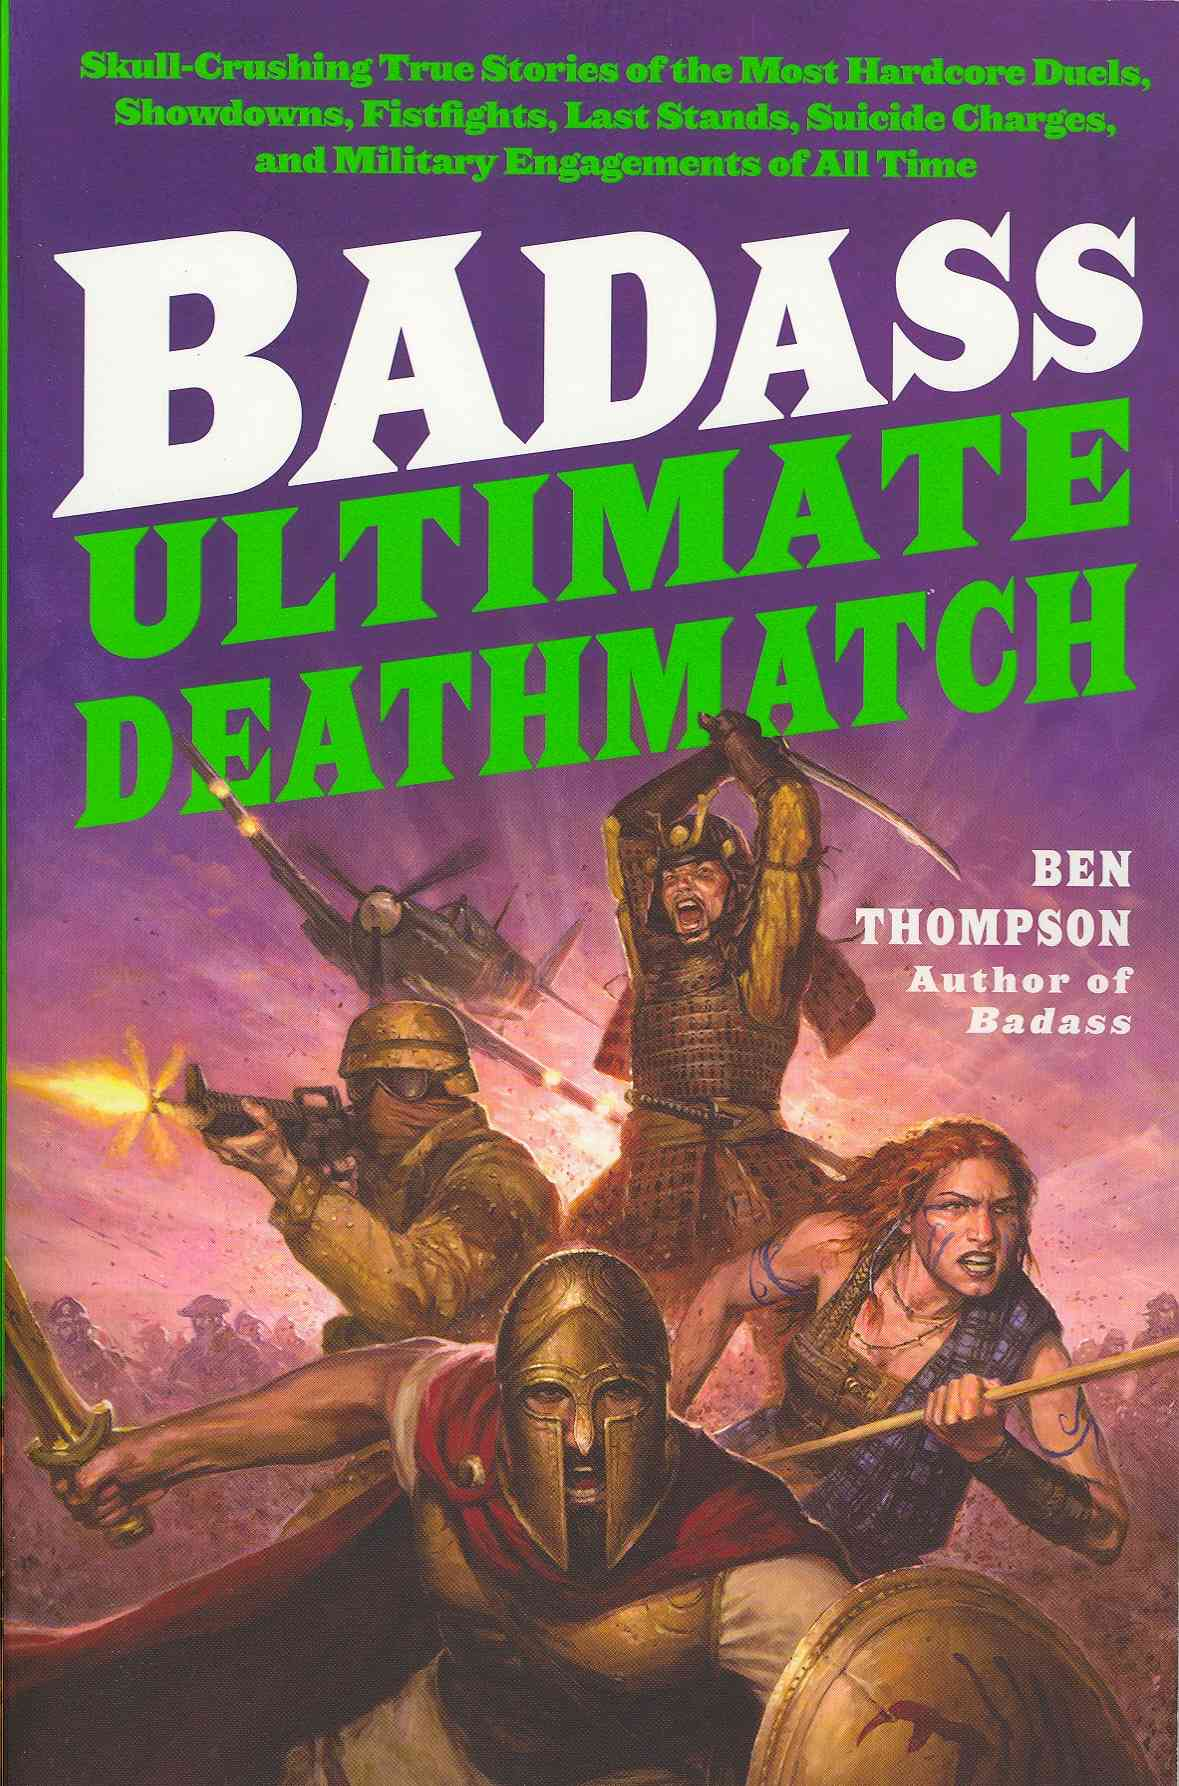 Badass: Ultimate Deathmatch By Thompson, Ben